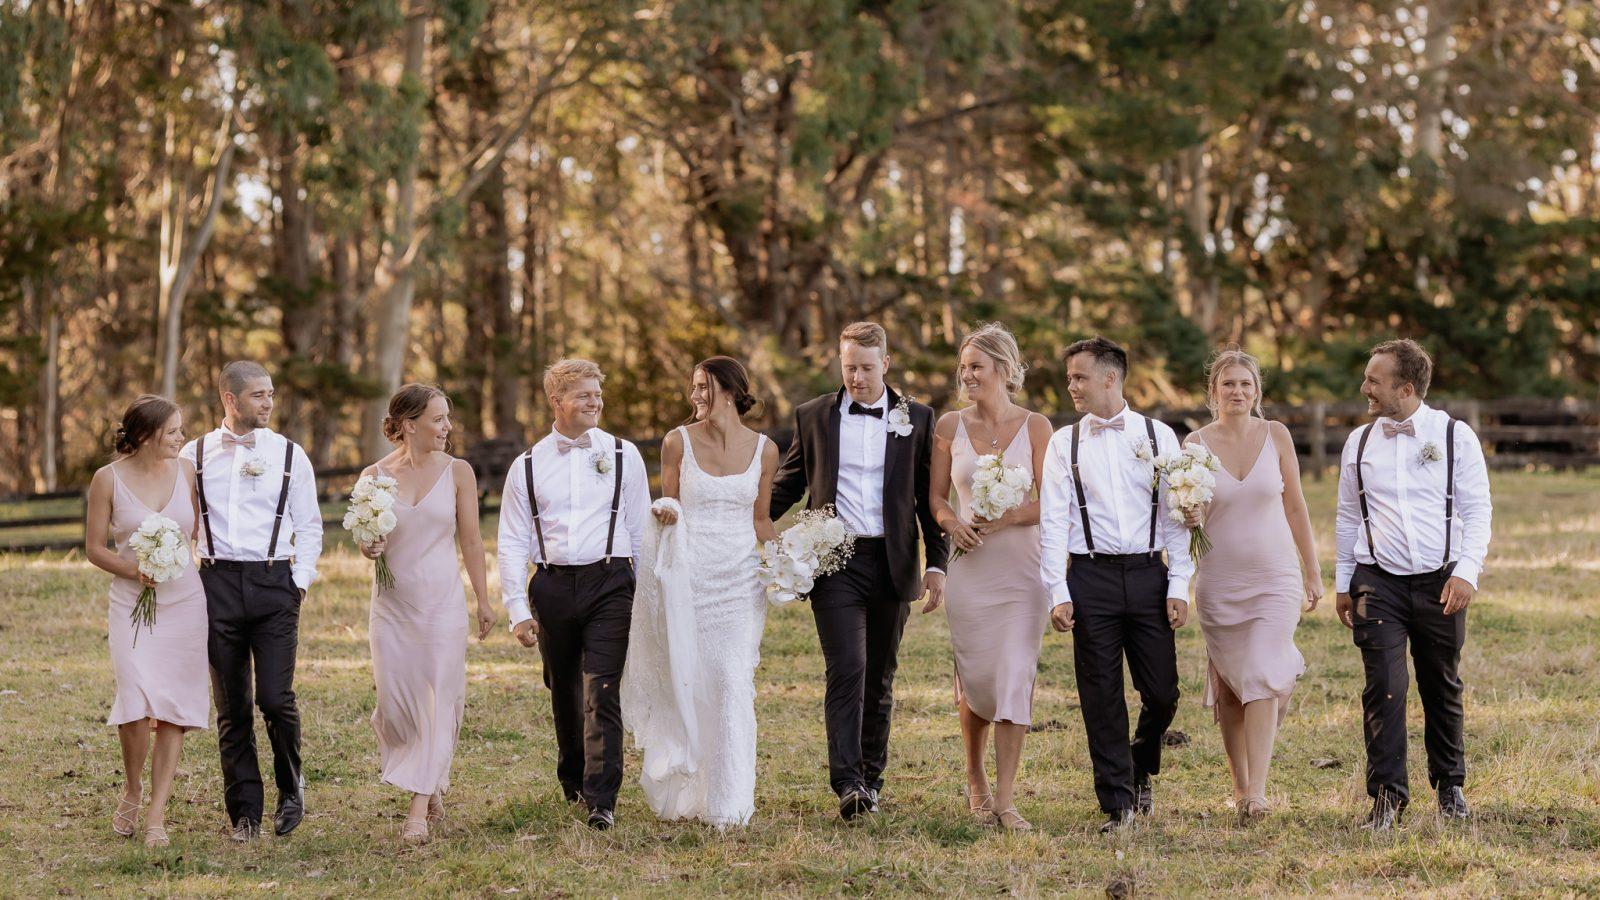 Pink Wedding party walking in field having fun